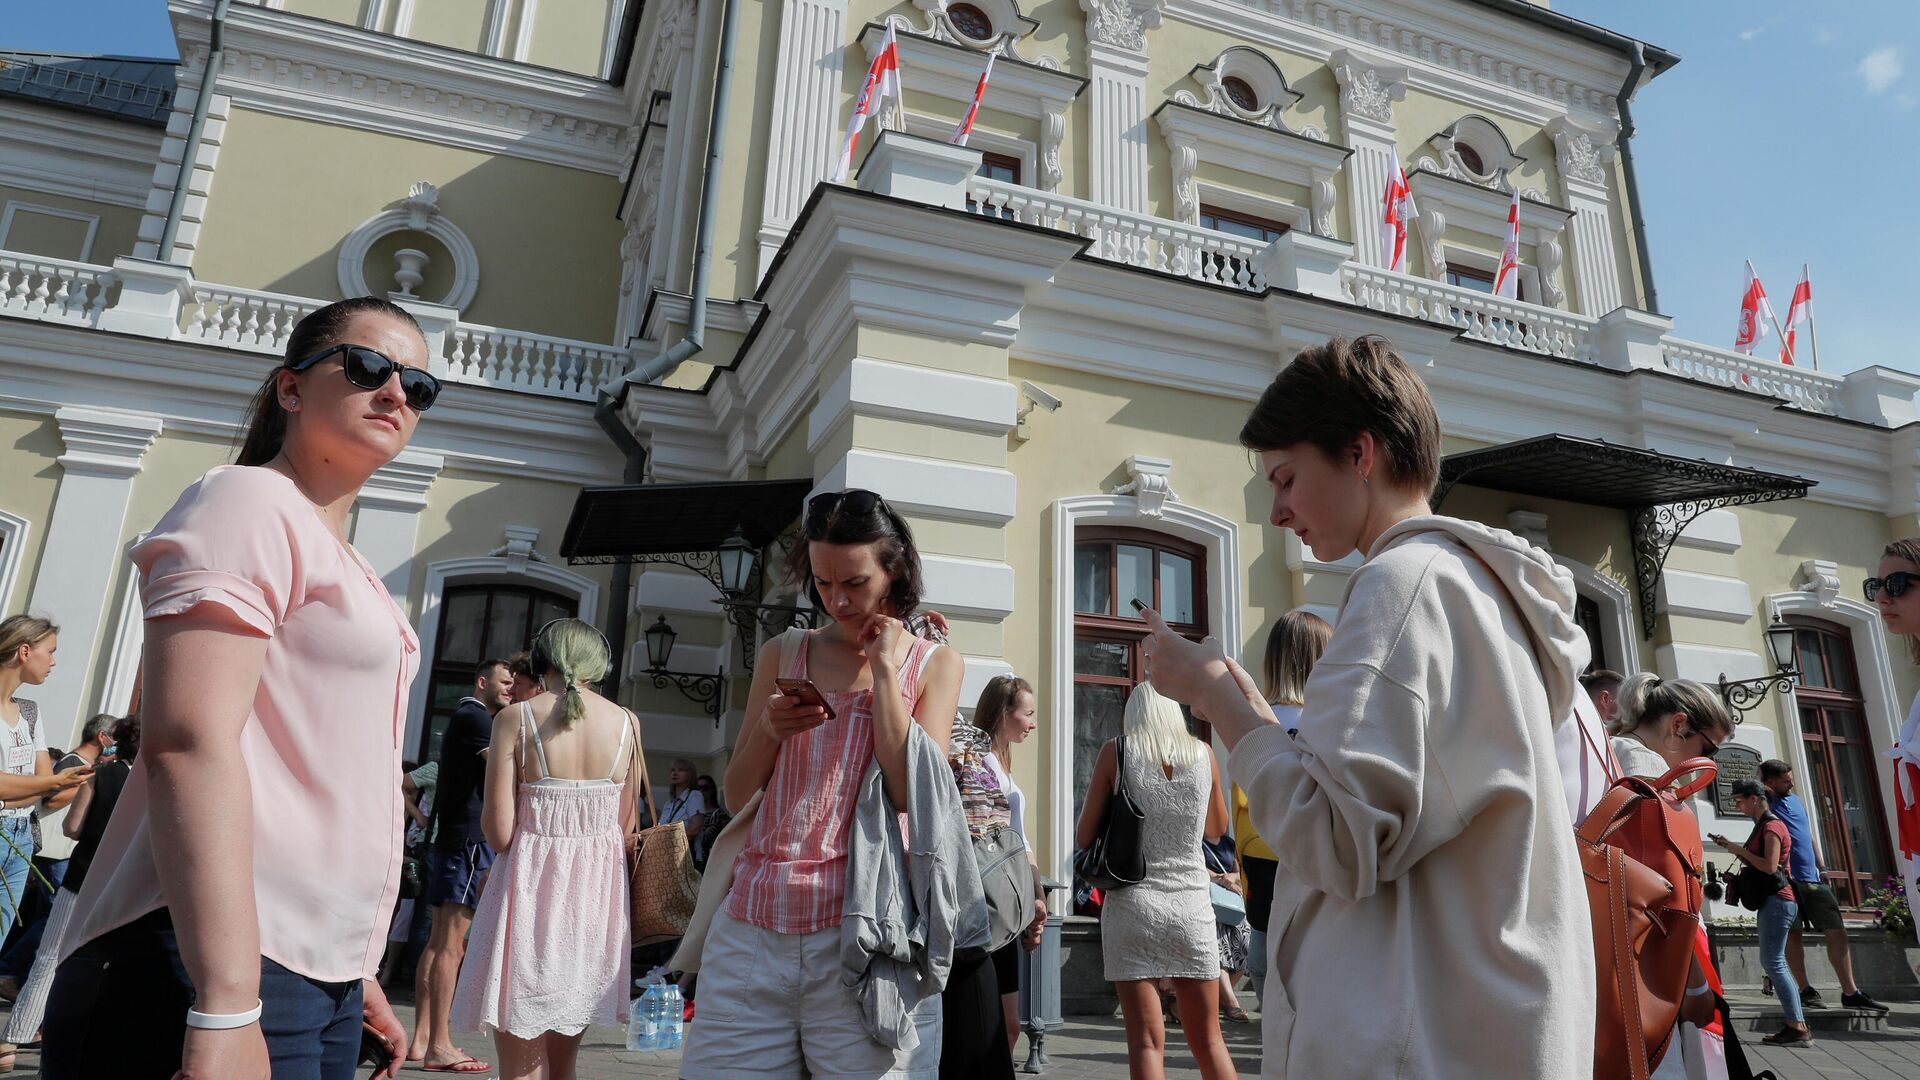 Протестующие возле Купаловского театра в Минске - РИА Новости, 1920, 21.08.2020